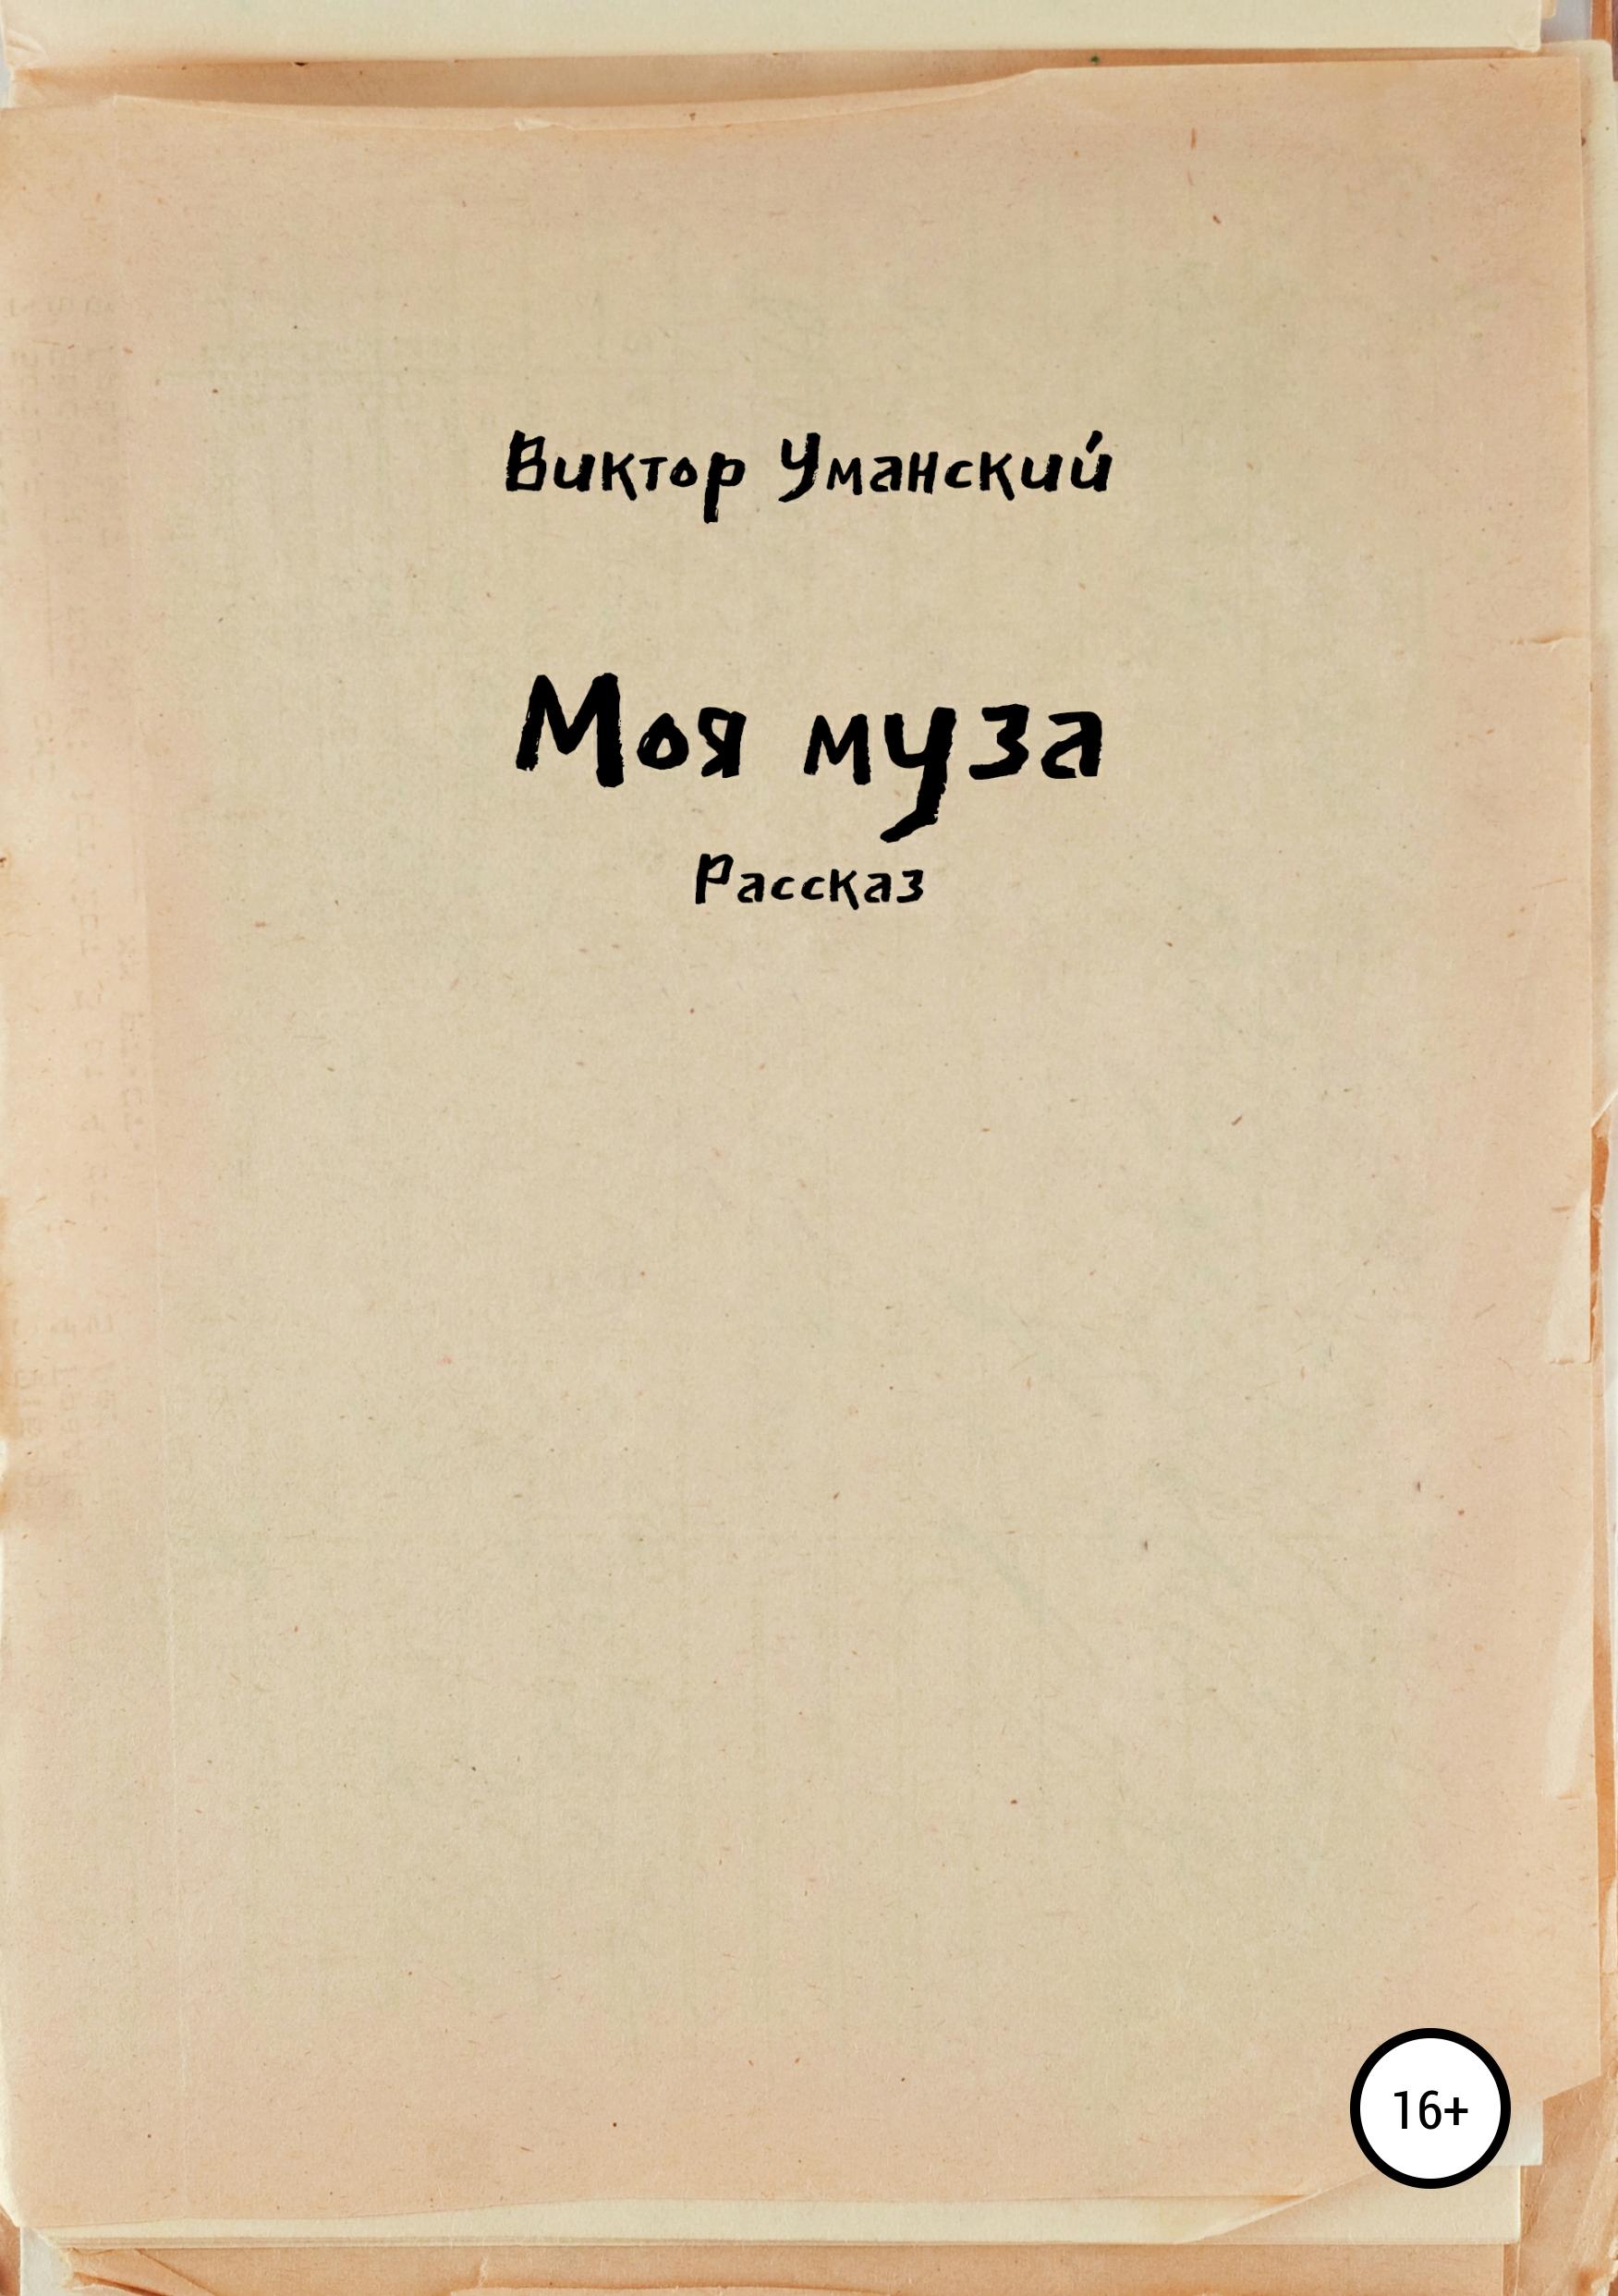 Виктор Александрович Уманский Моя муза